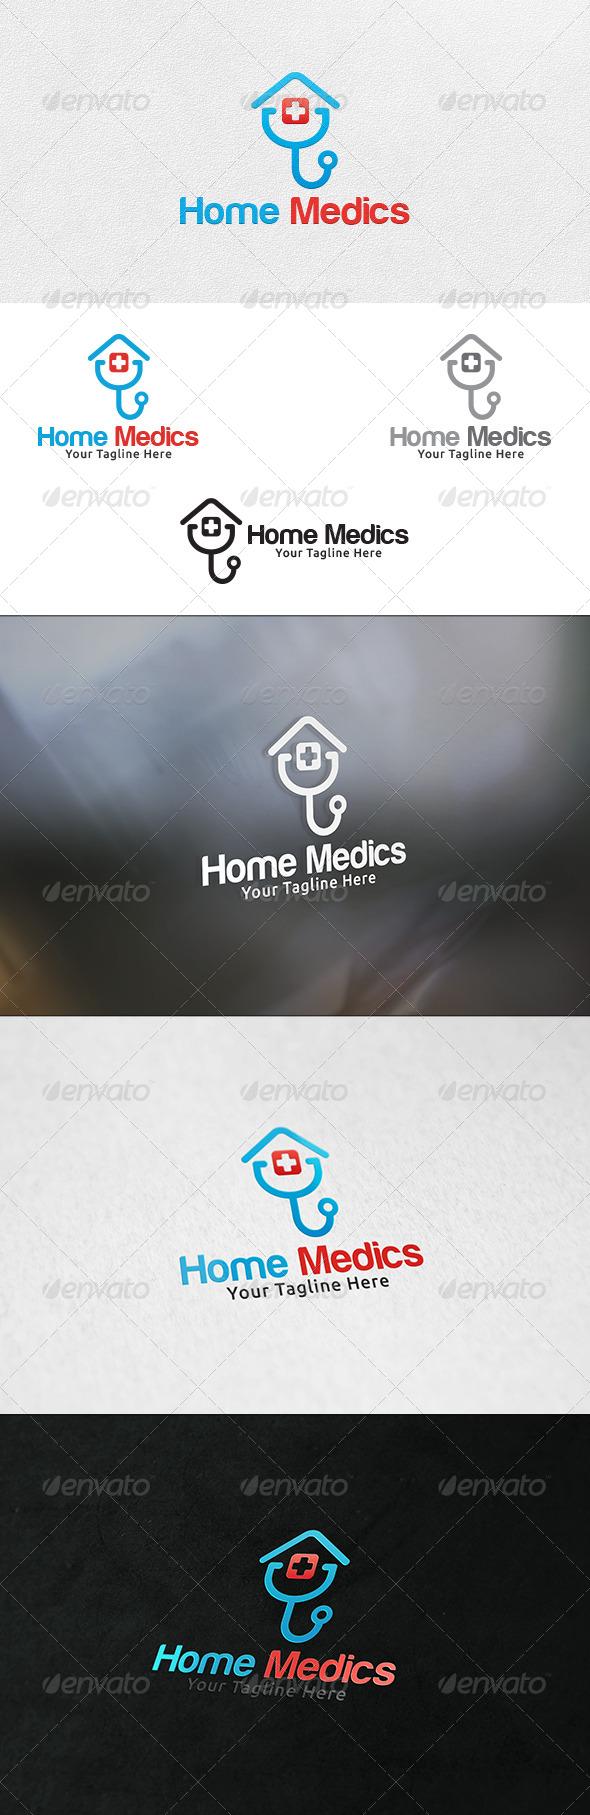 Home Medics - Logo Template - Buildings Logo Templates